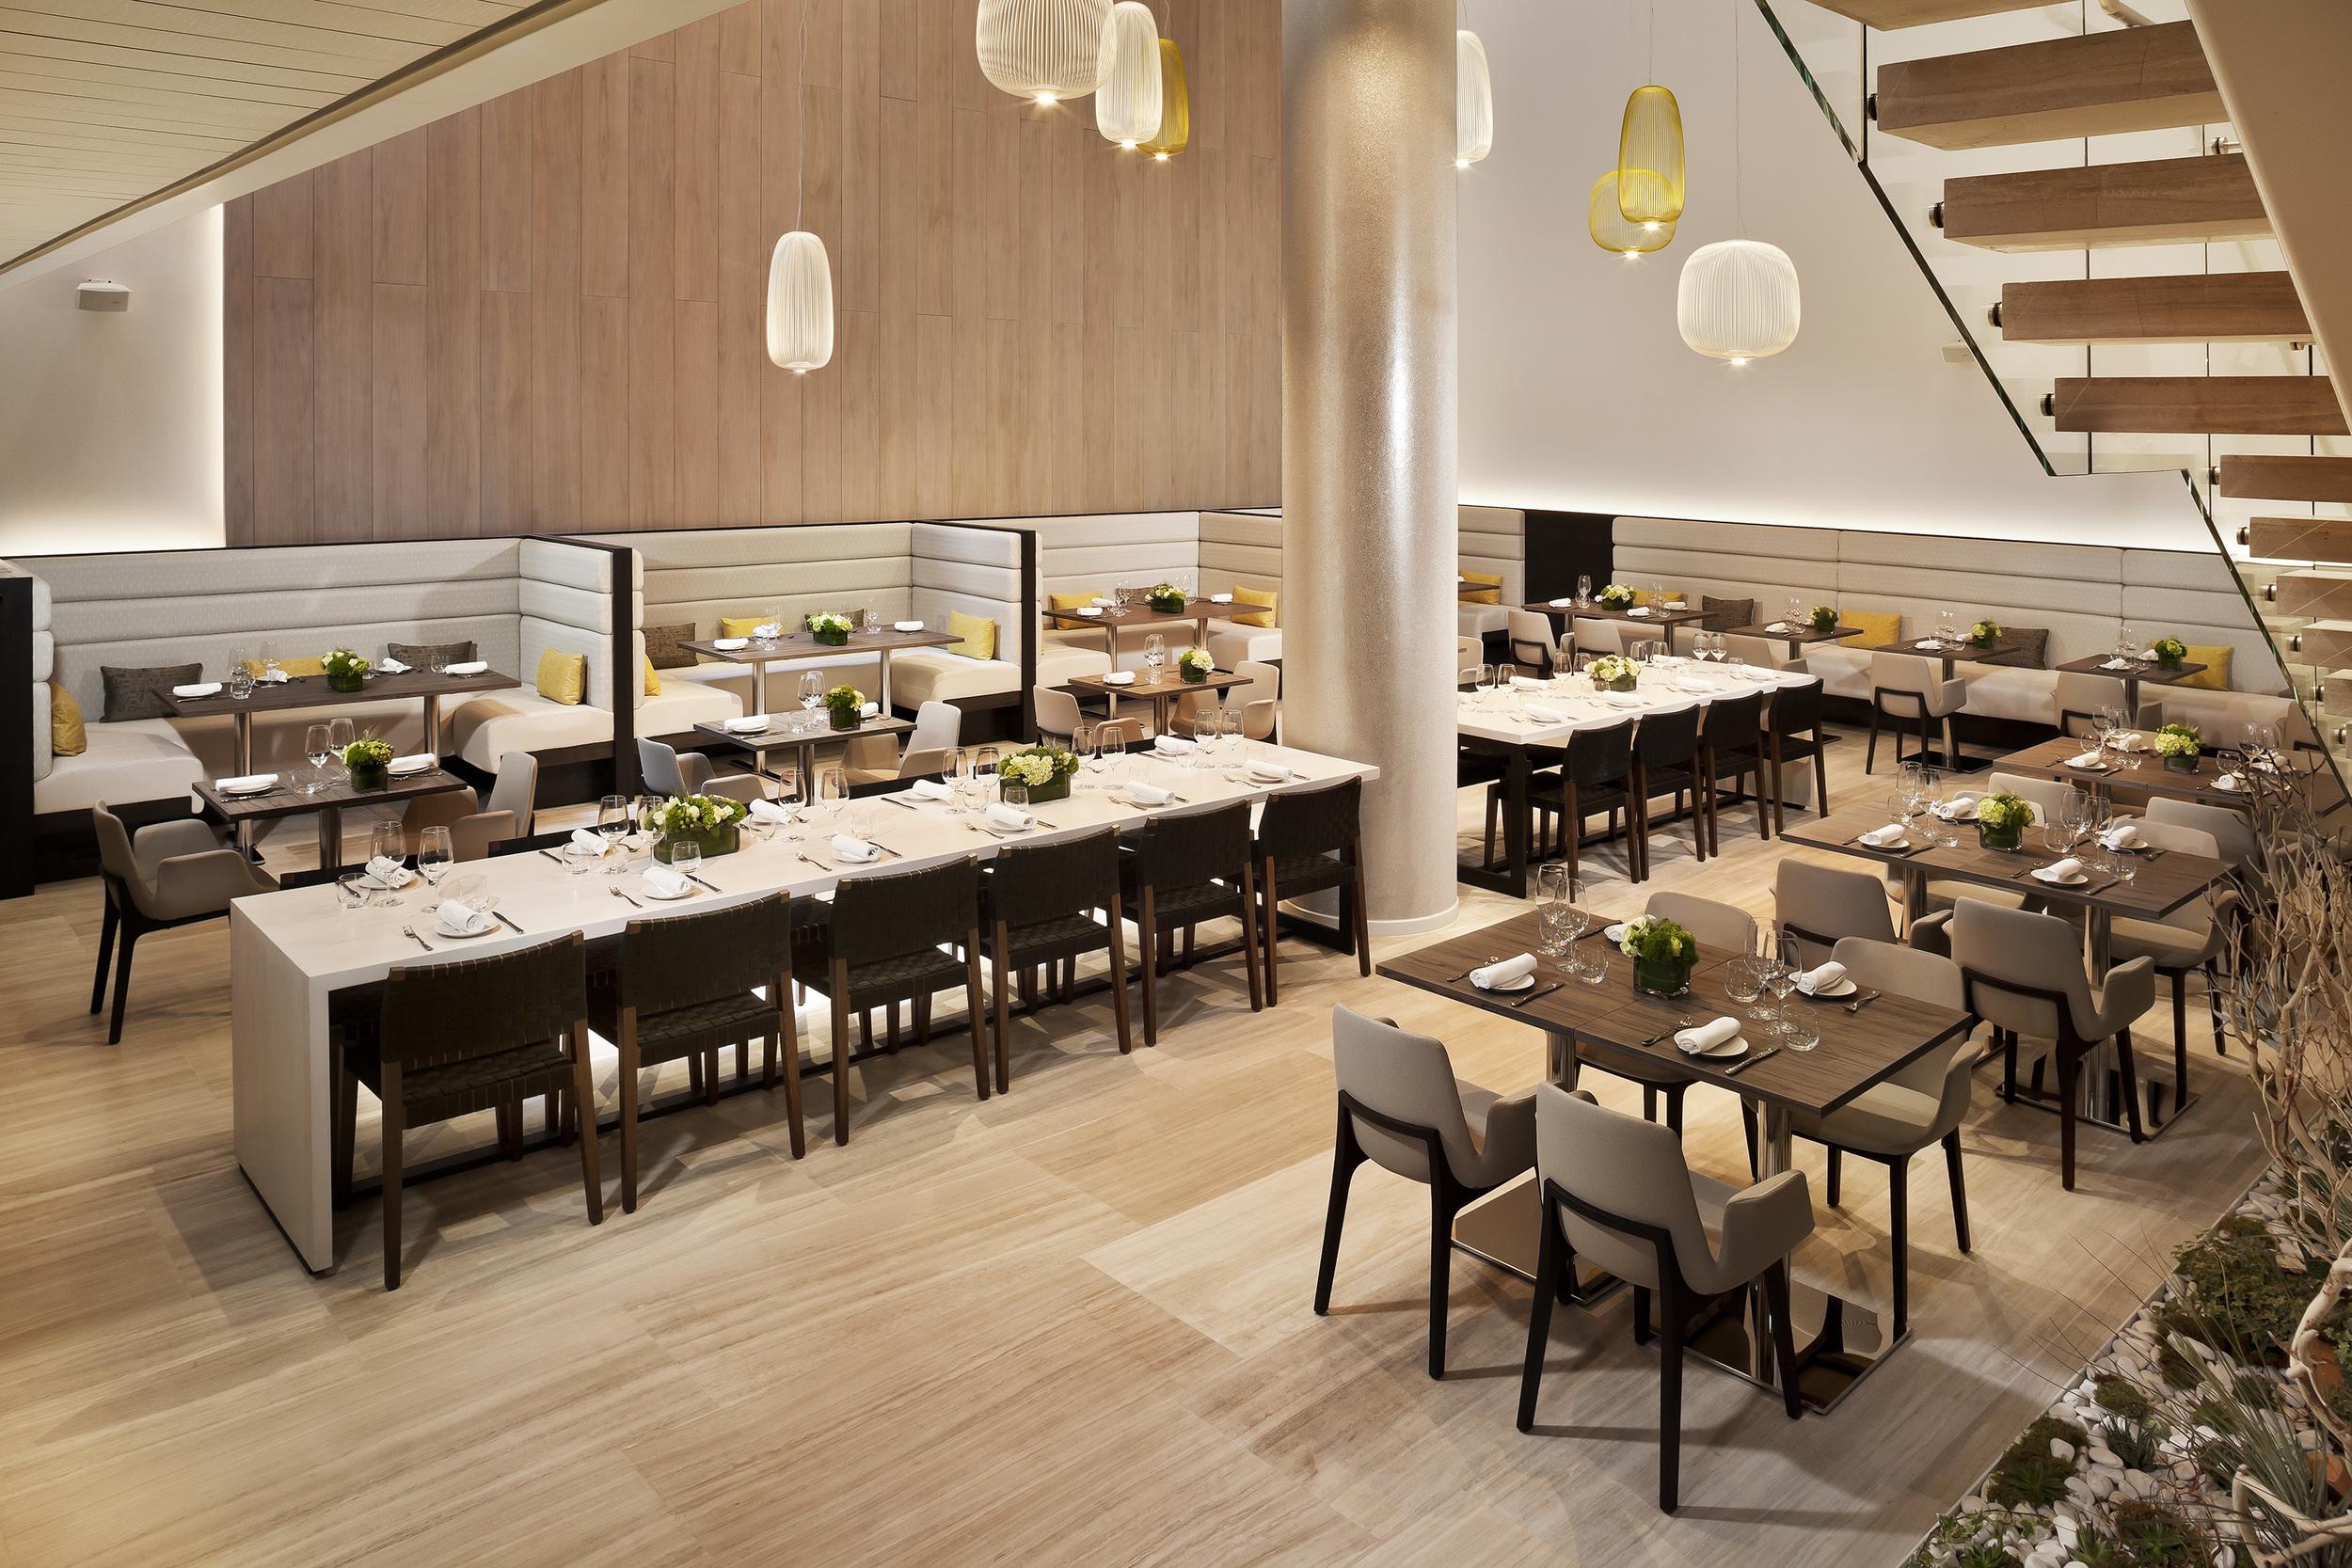 25InnsideNewYork-ImperoCaffeRestaurant.jpg